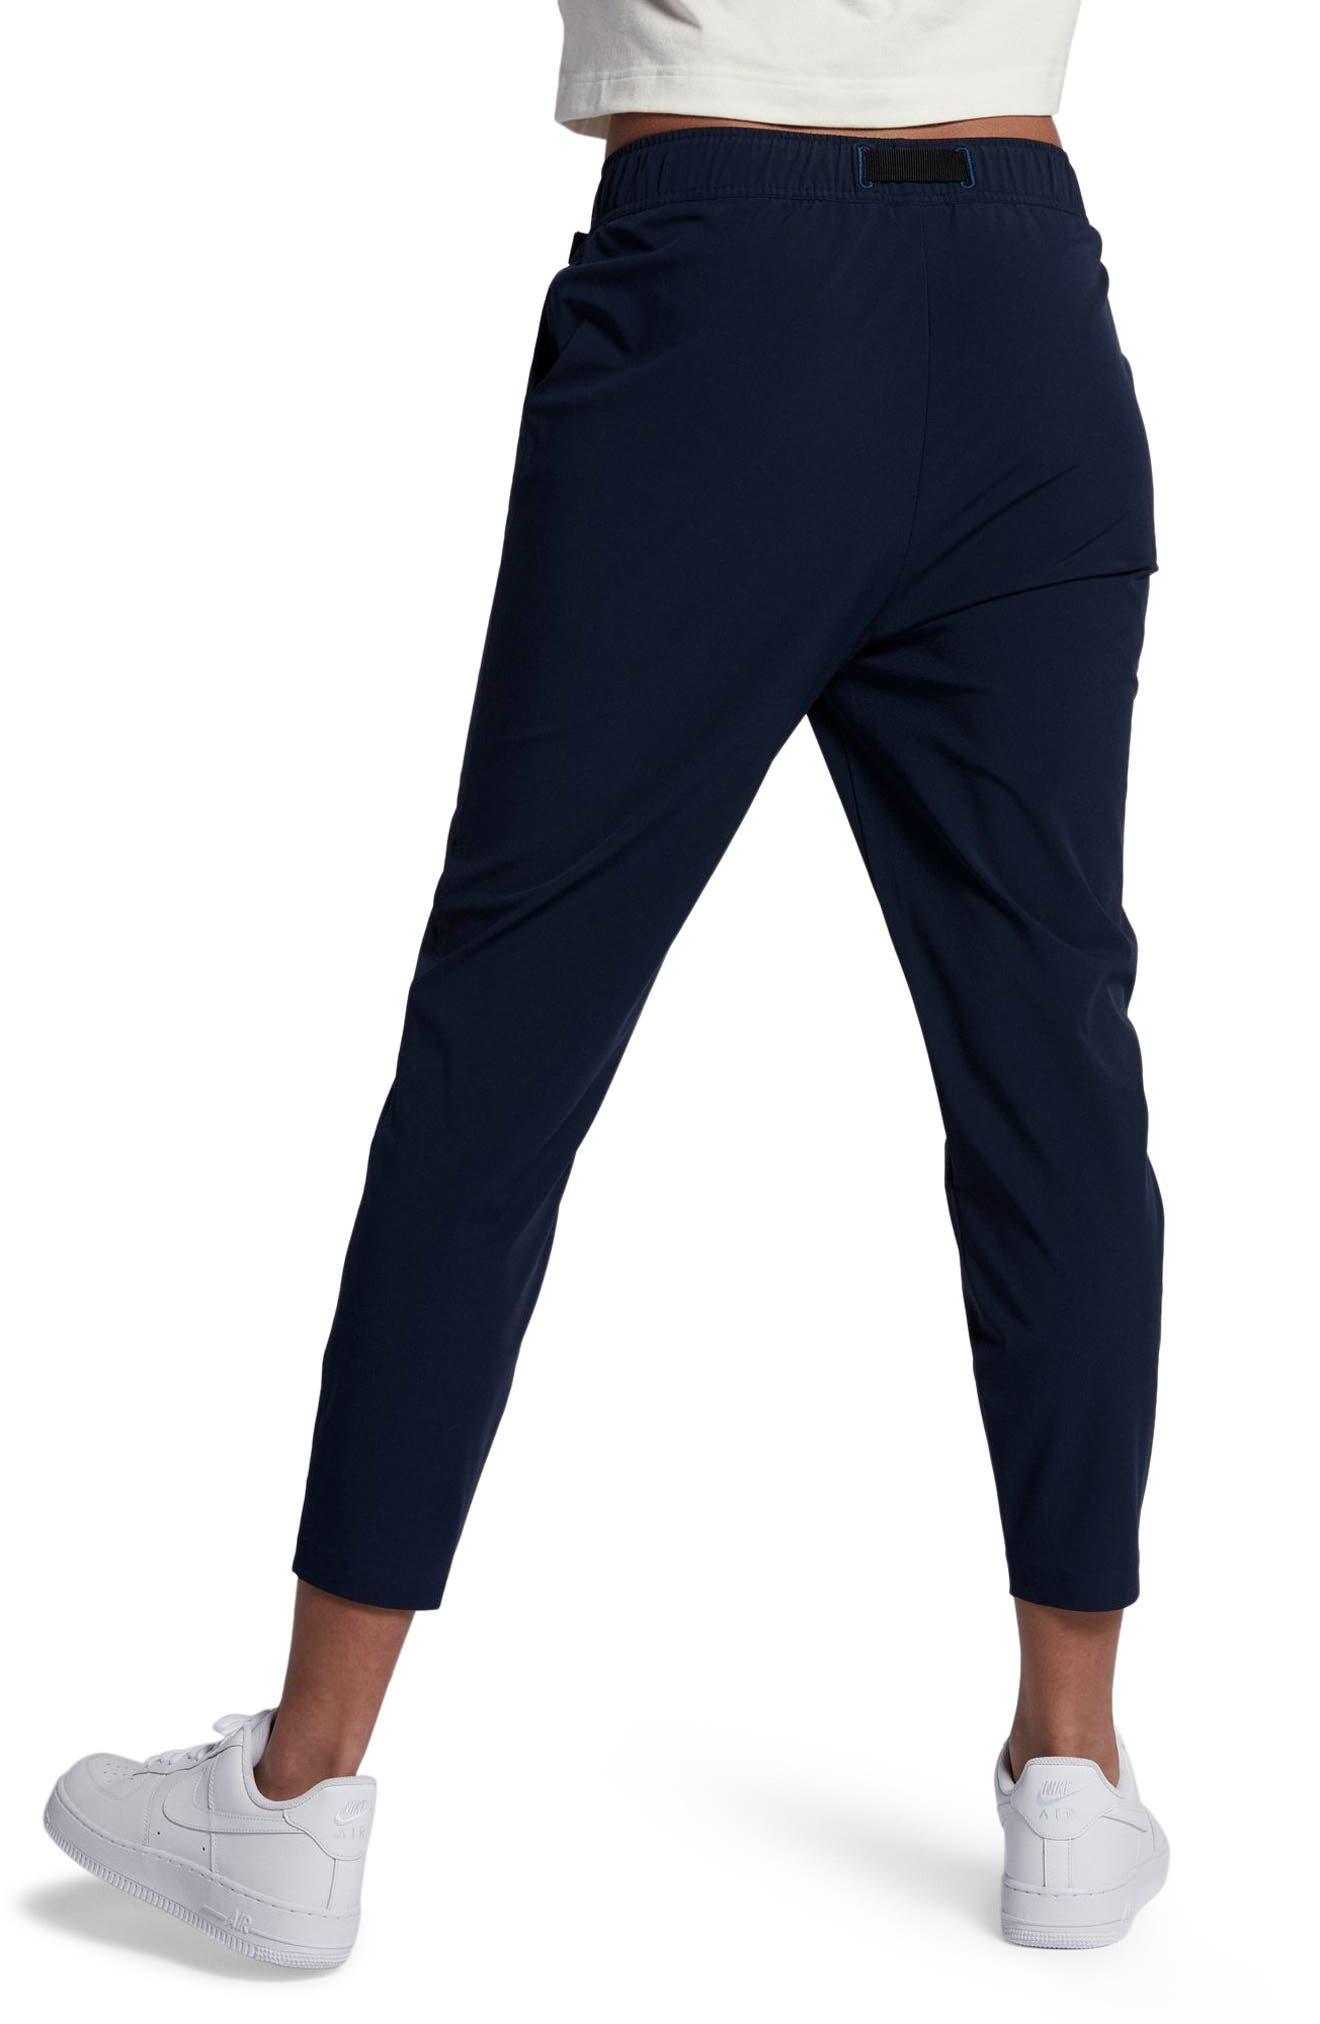 Alternate Image 3  - Nike NikeLab Essentials Women's Stretch Woven Pants